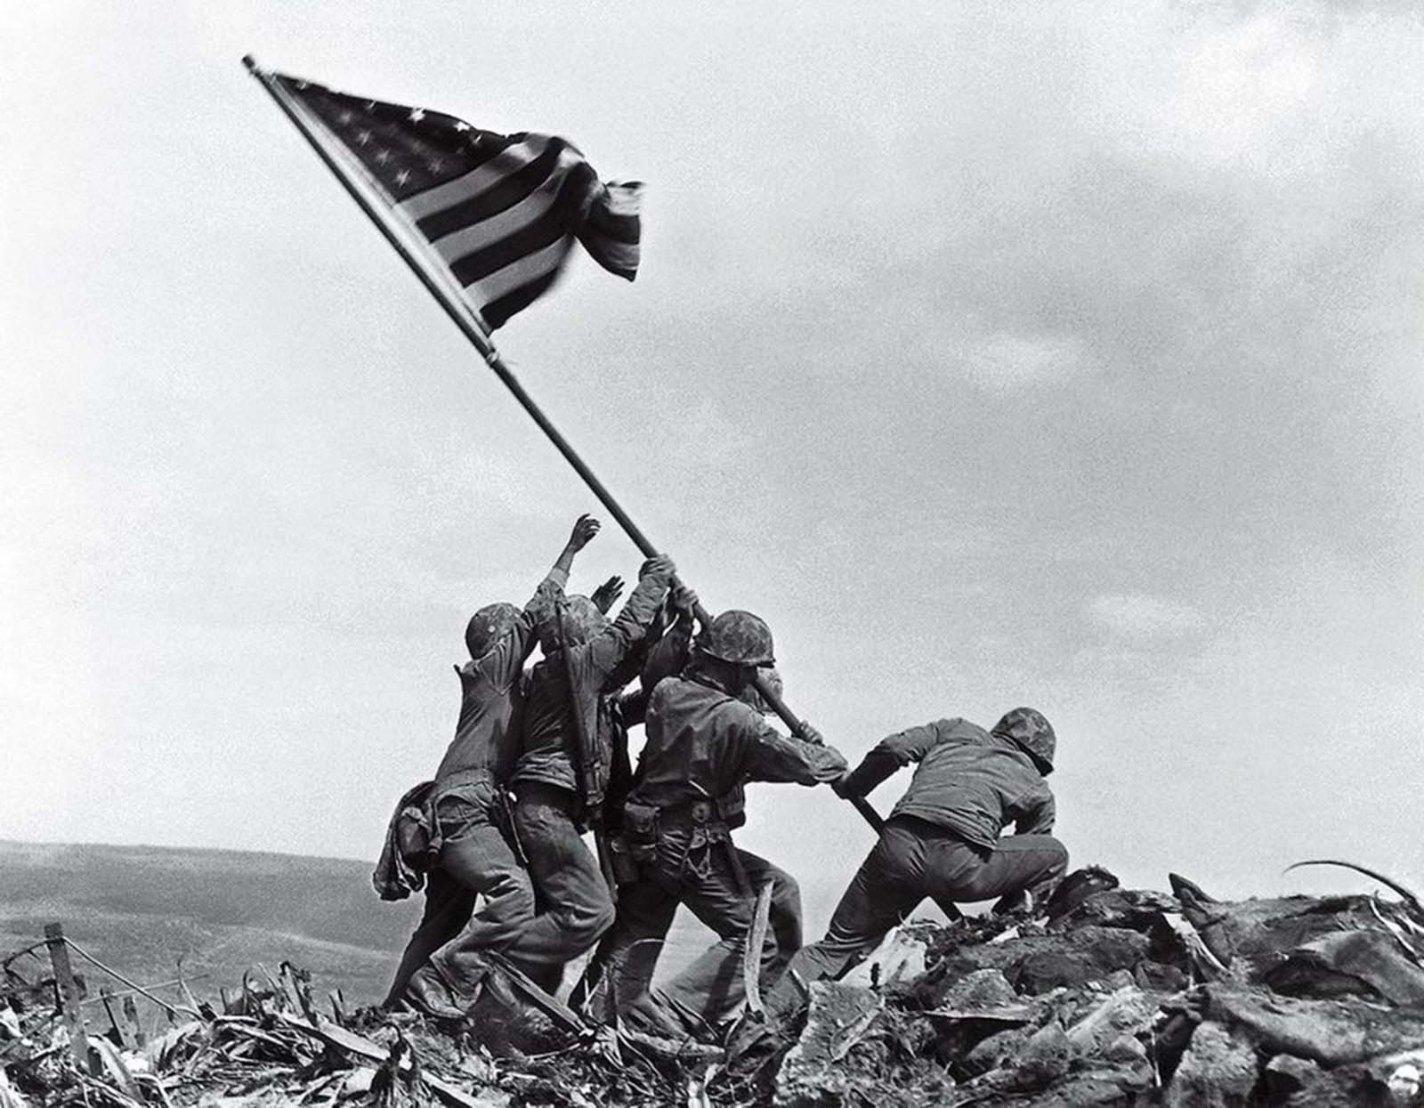 Historic photo: Flag Raising on Iwo Jima, Joe Rosenthal, 1945